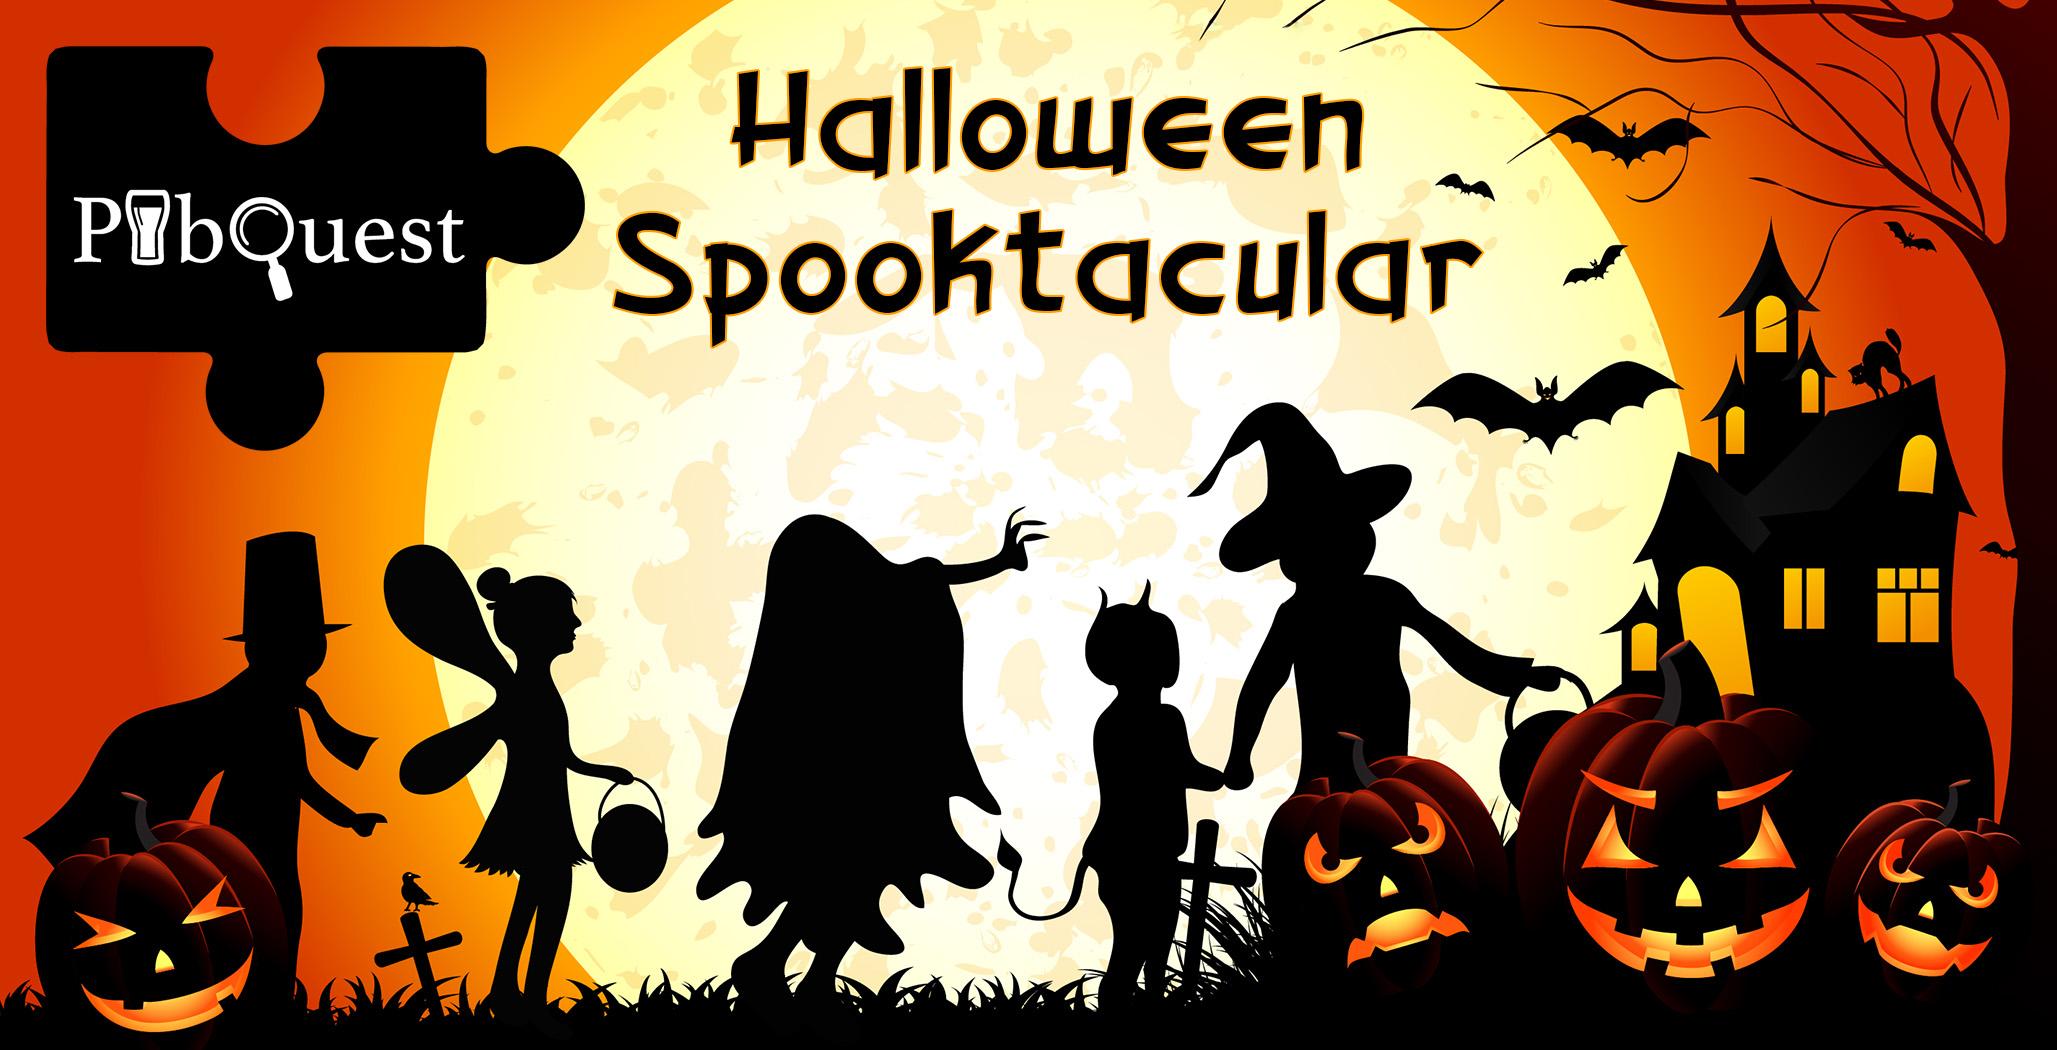 October PubQuest: Halloween Spooktacular